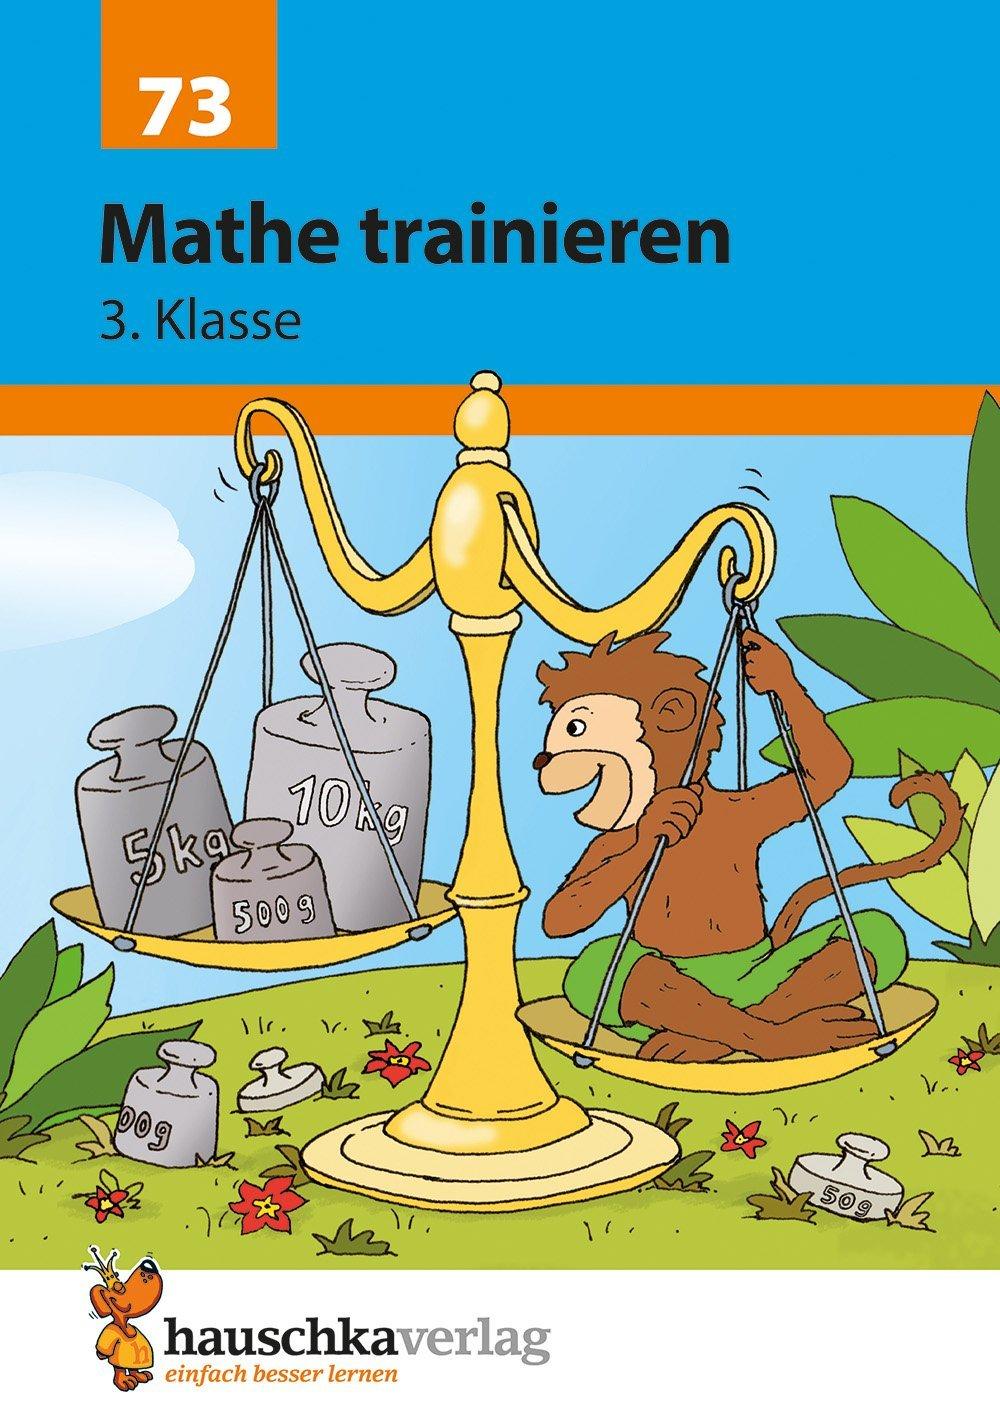 Mathe trainieren 3. Klasse Broschüre – 27. Oktober 2017 Helena Heiß Gisela Specht Hauschka Verlag 3881000739